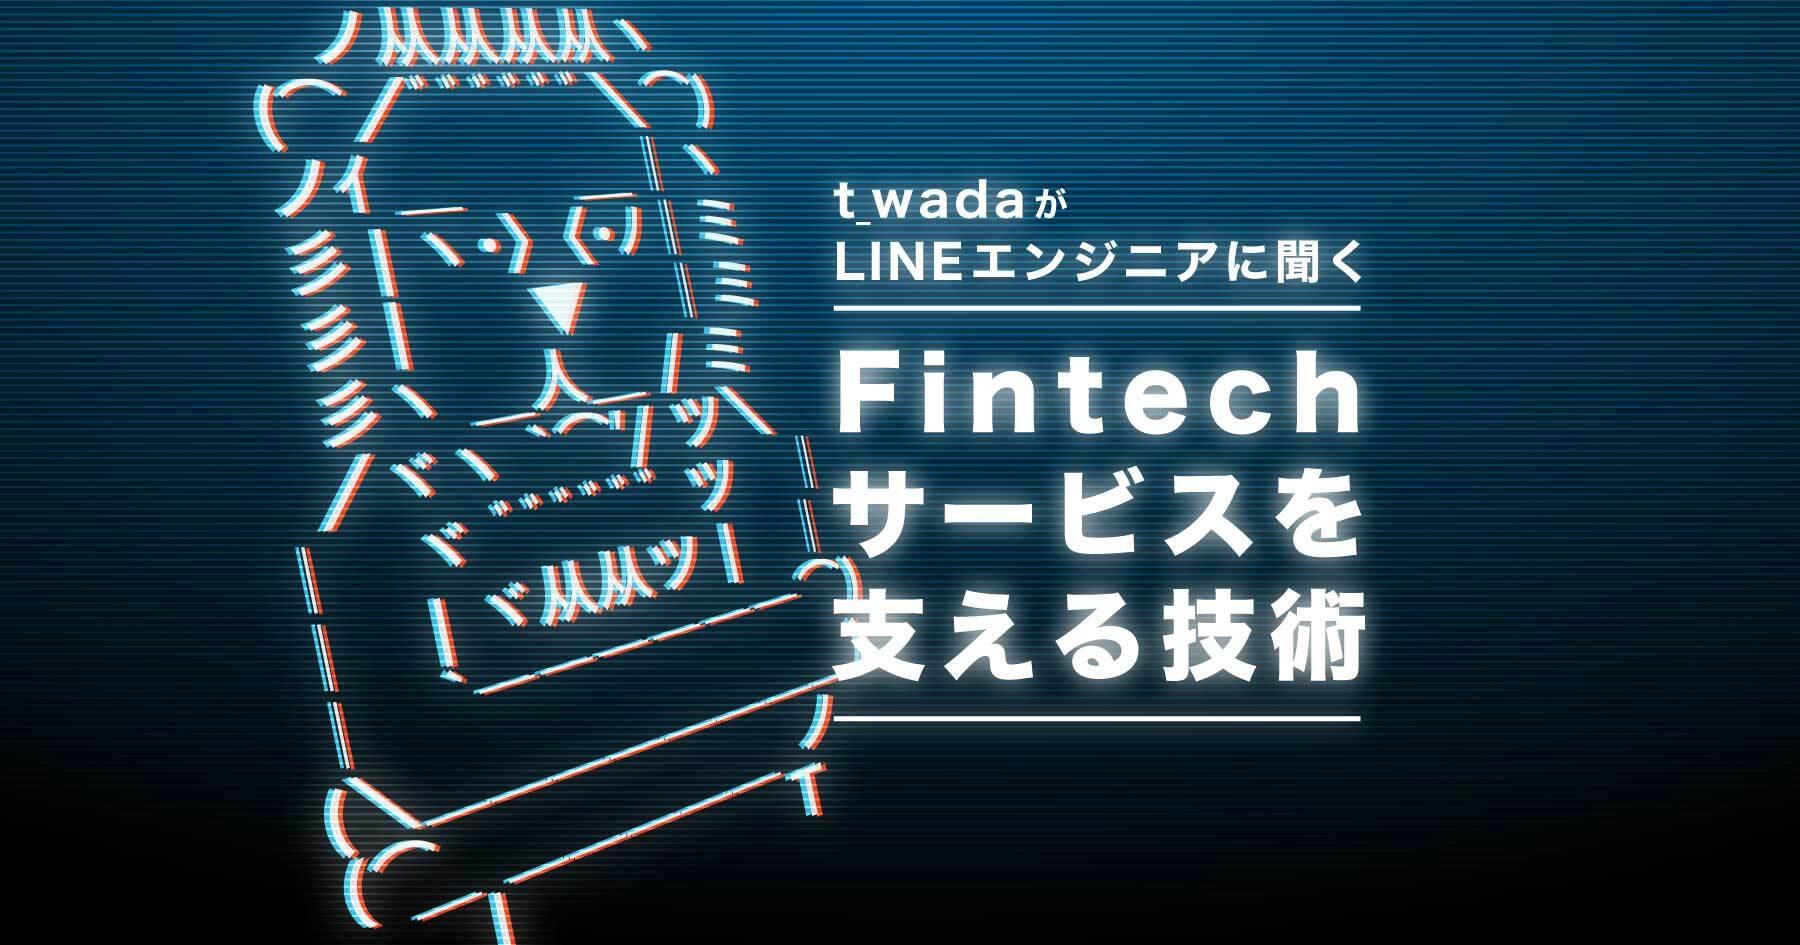 LINEのFintech事業はどんな技術を用いている? t-wadaが開発コアメンバーに聞く